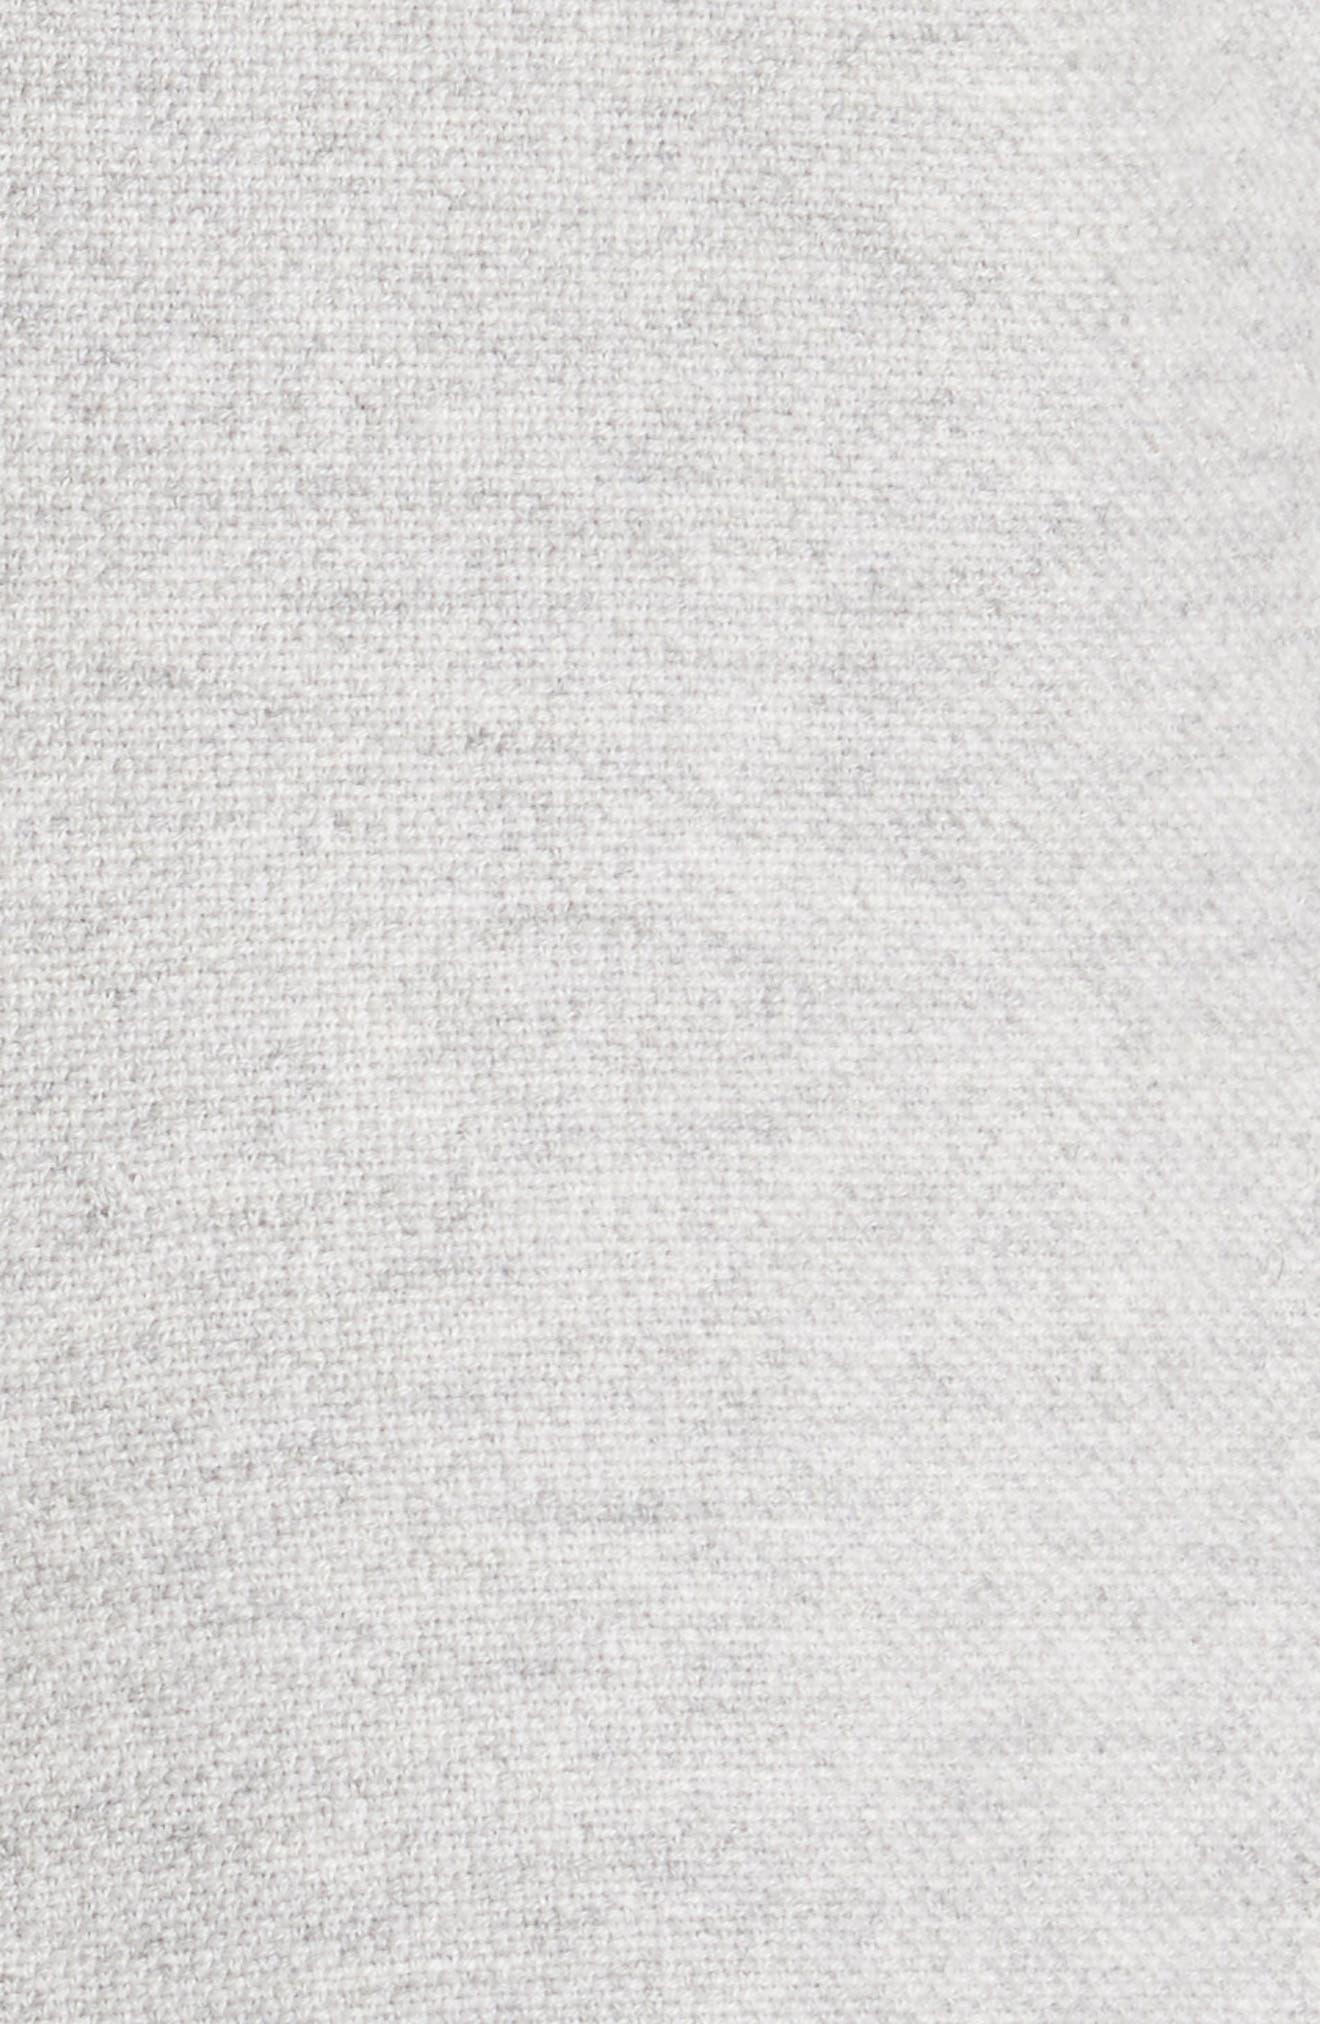 Alternate Image 3  - Max Mara Segnale Cashmere Jacket